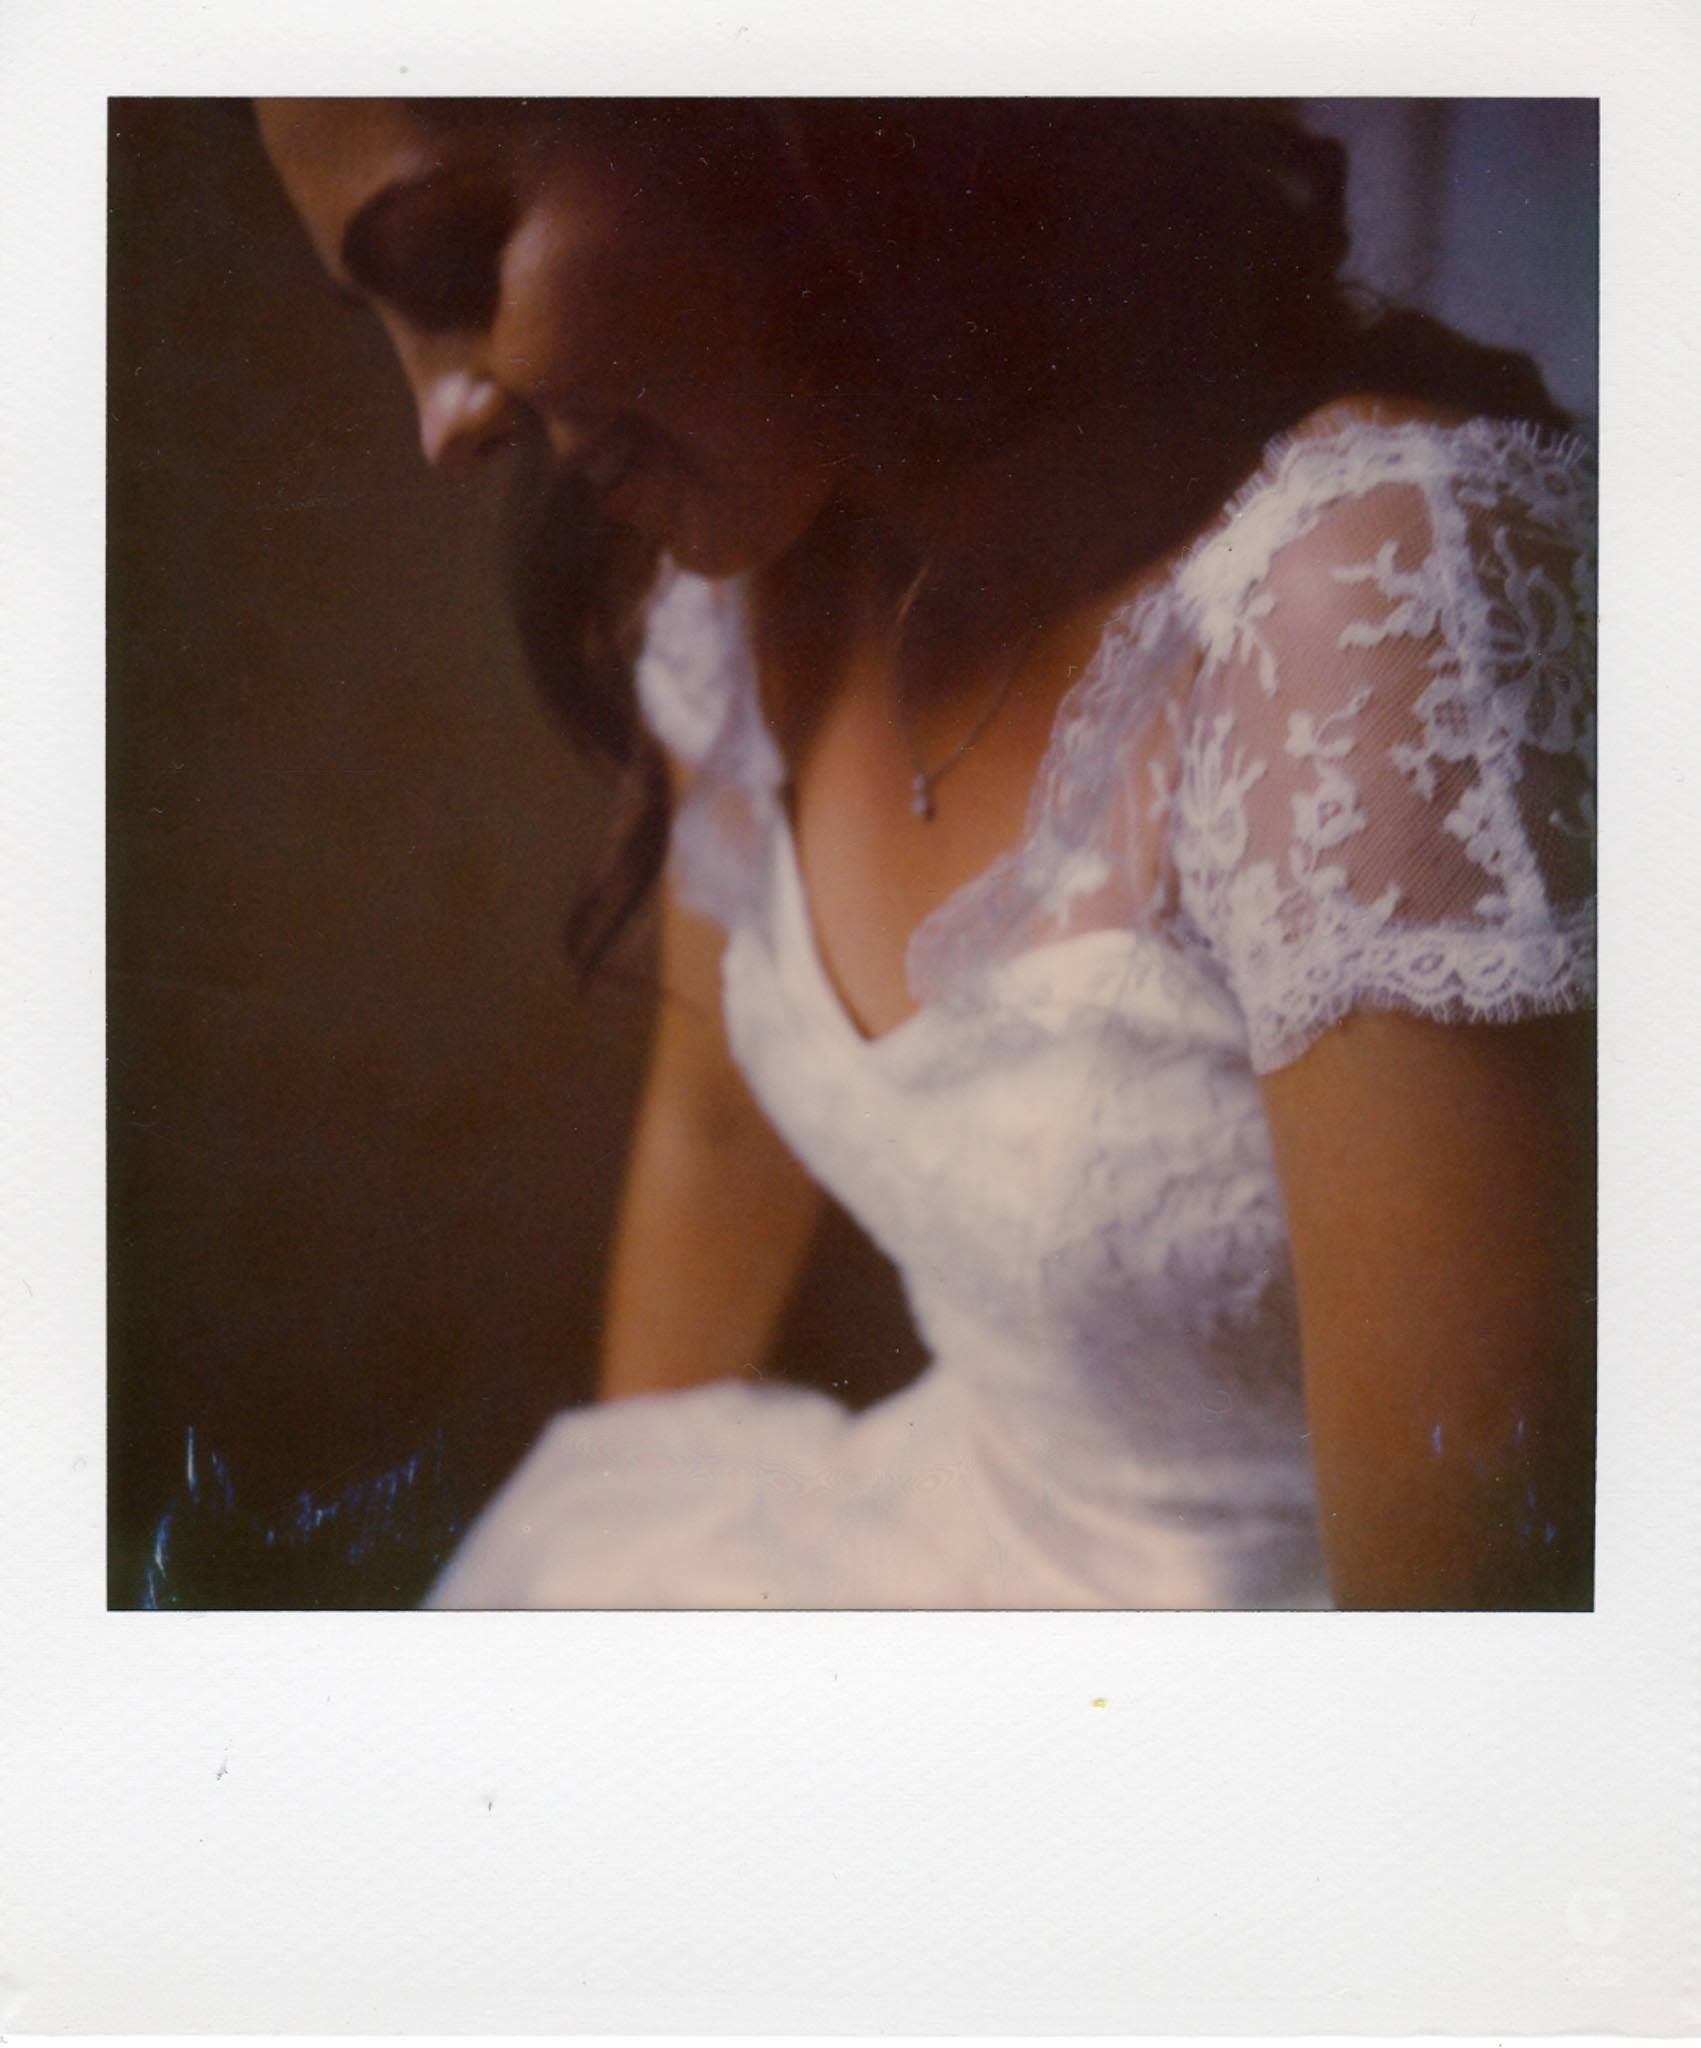 polaroid-outtakes-bride-getting-ready.jpg